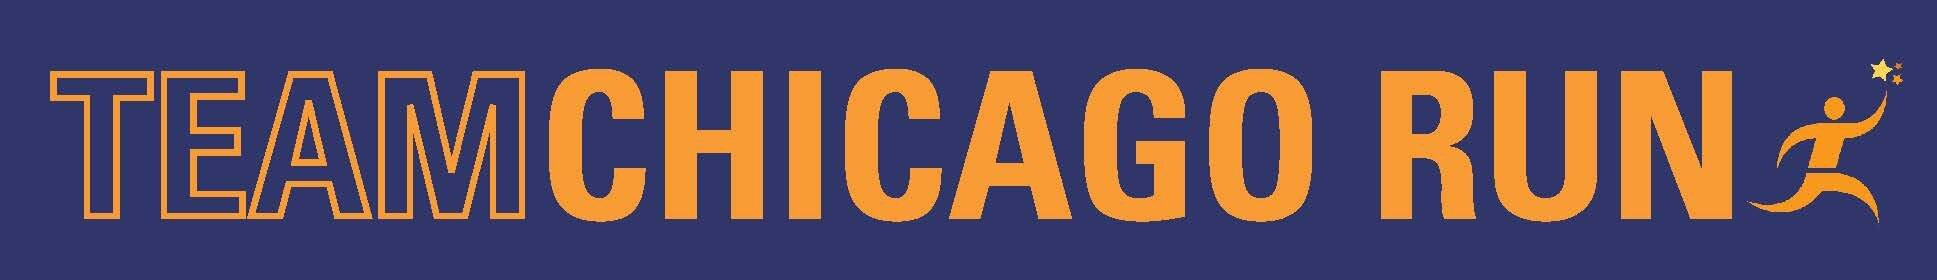 Team Chicago Run 2019 - Banner Logo.jpg